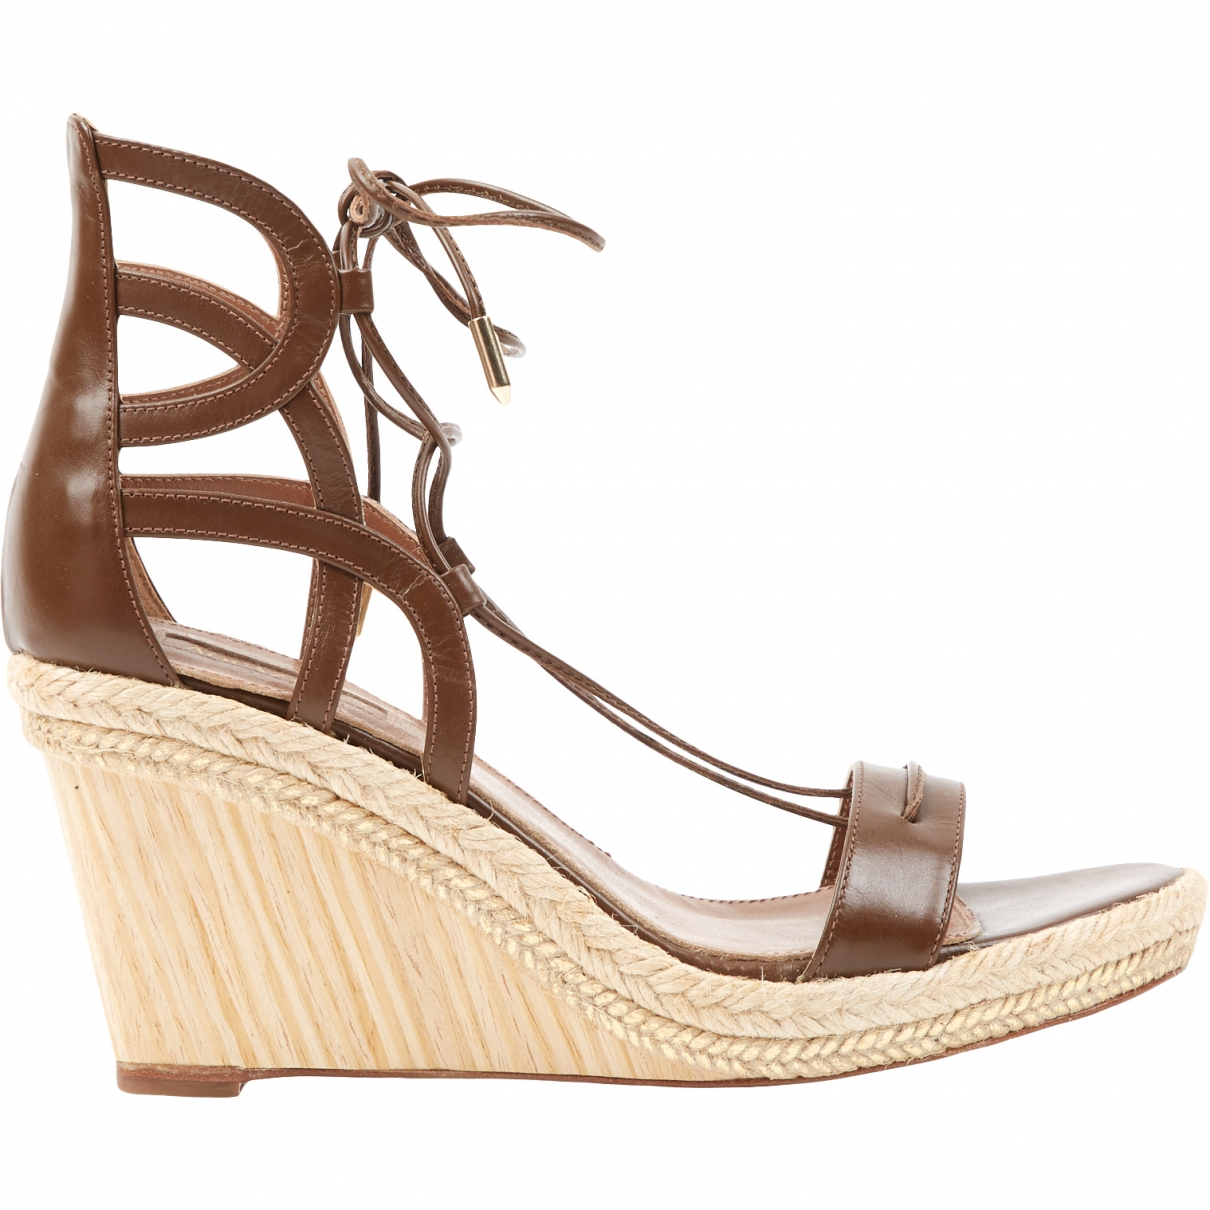 Aquazzura \N Brown Leather Sandals for Women 37 EU